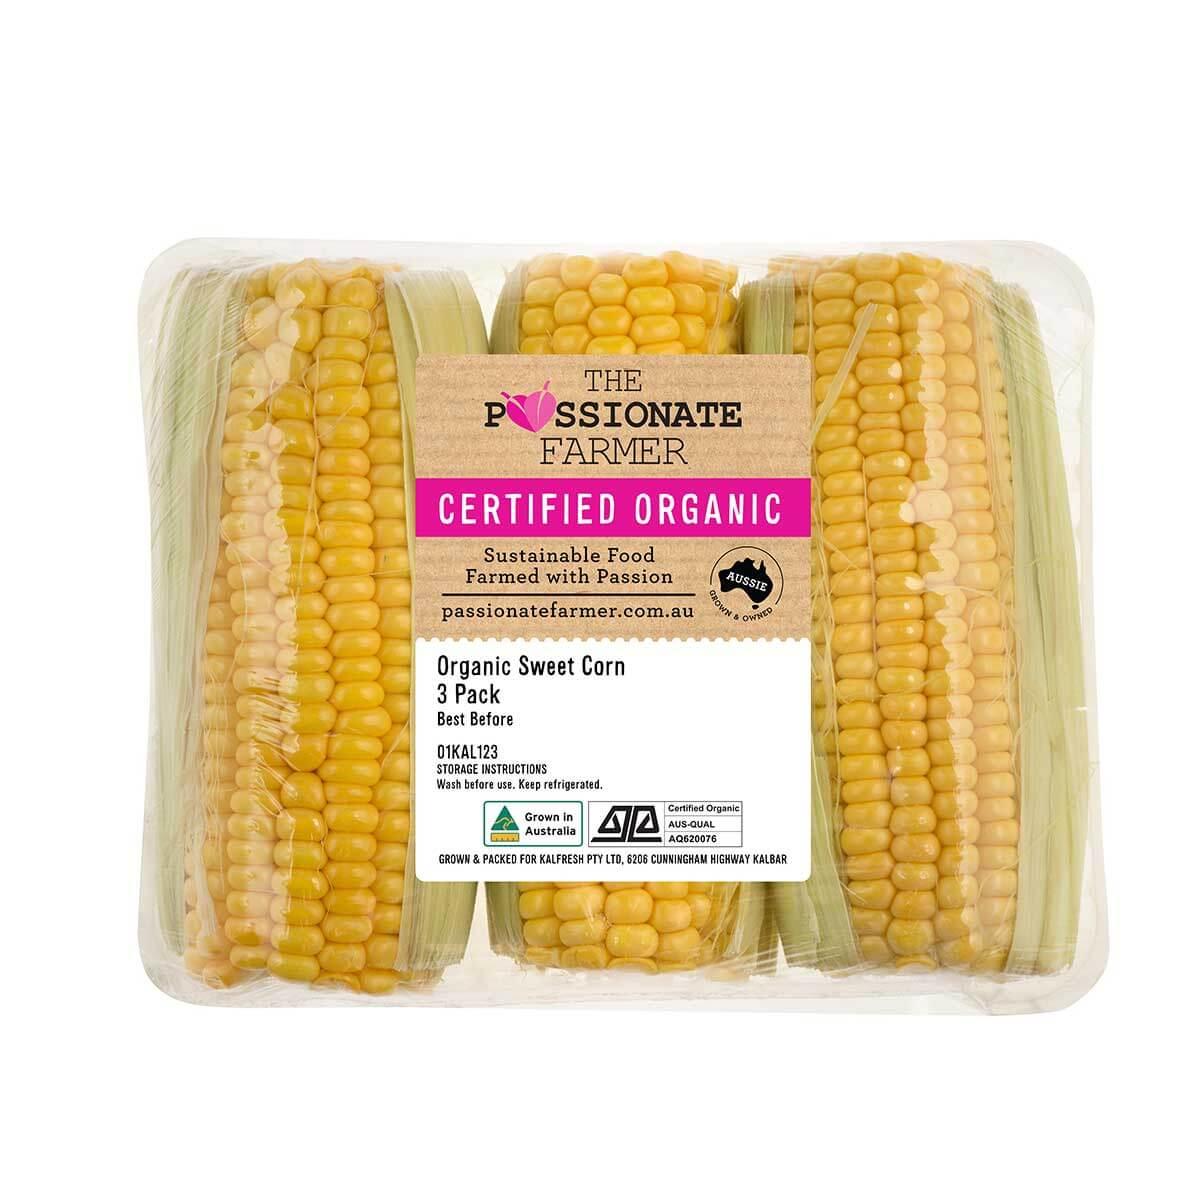 passionate-farmer-organic-sweet-corn